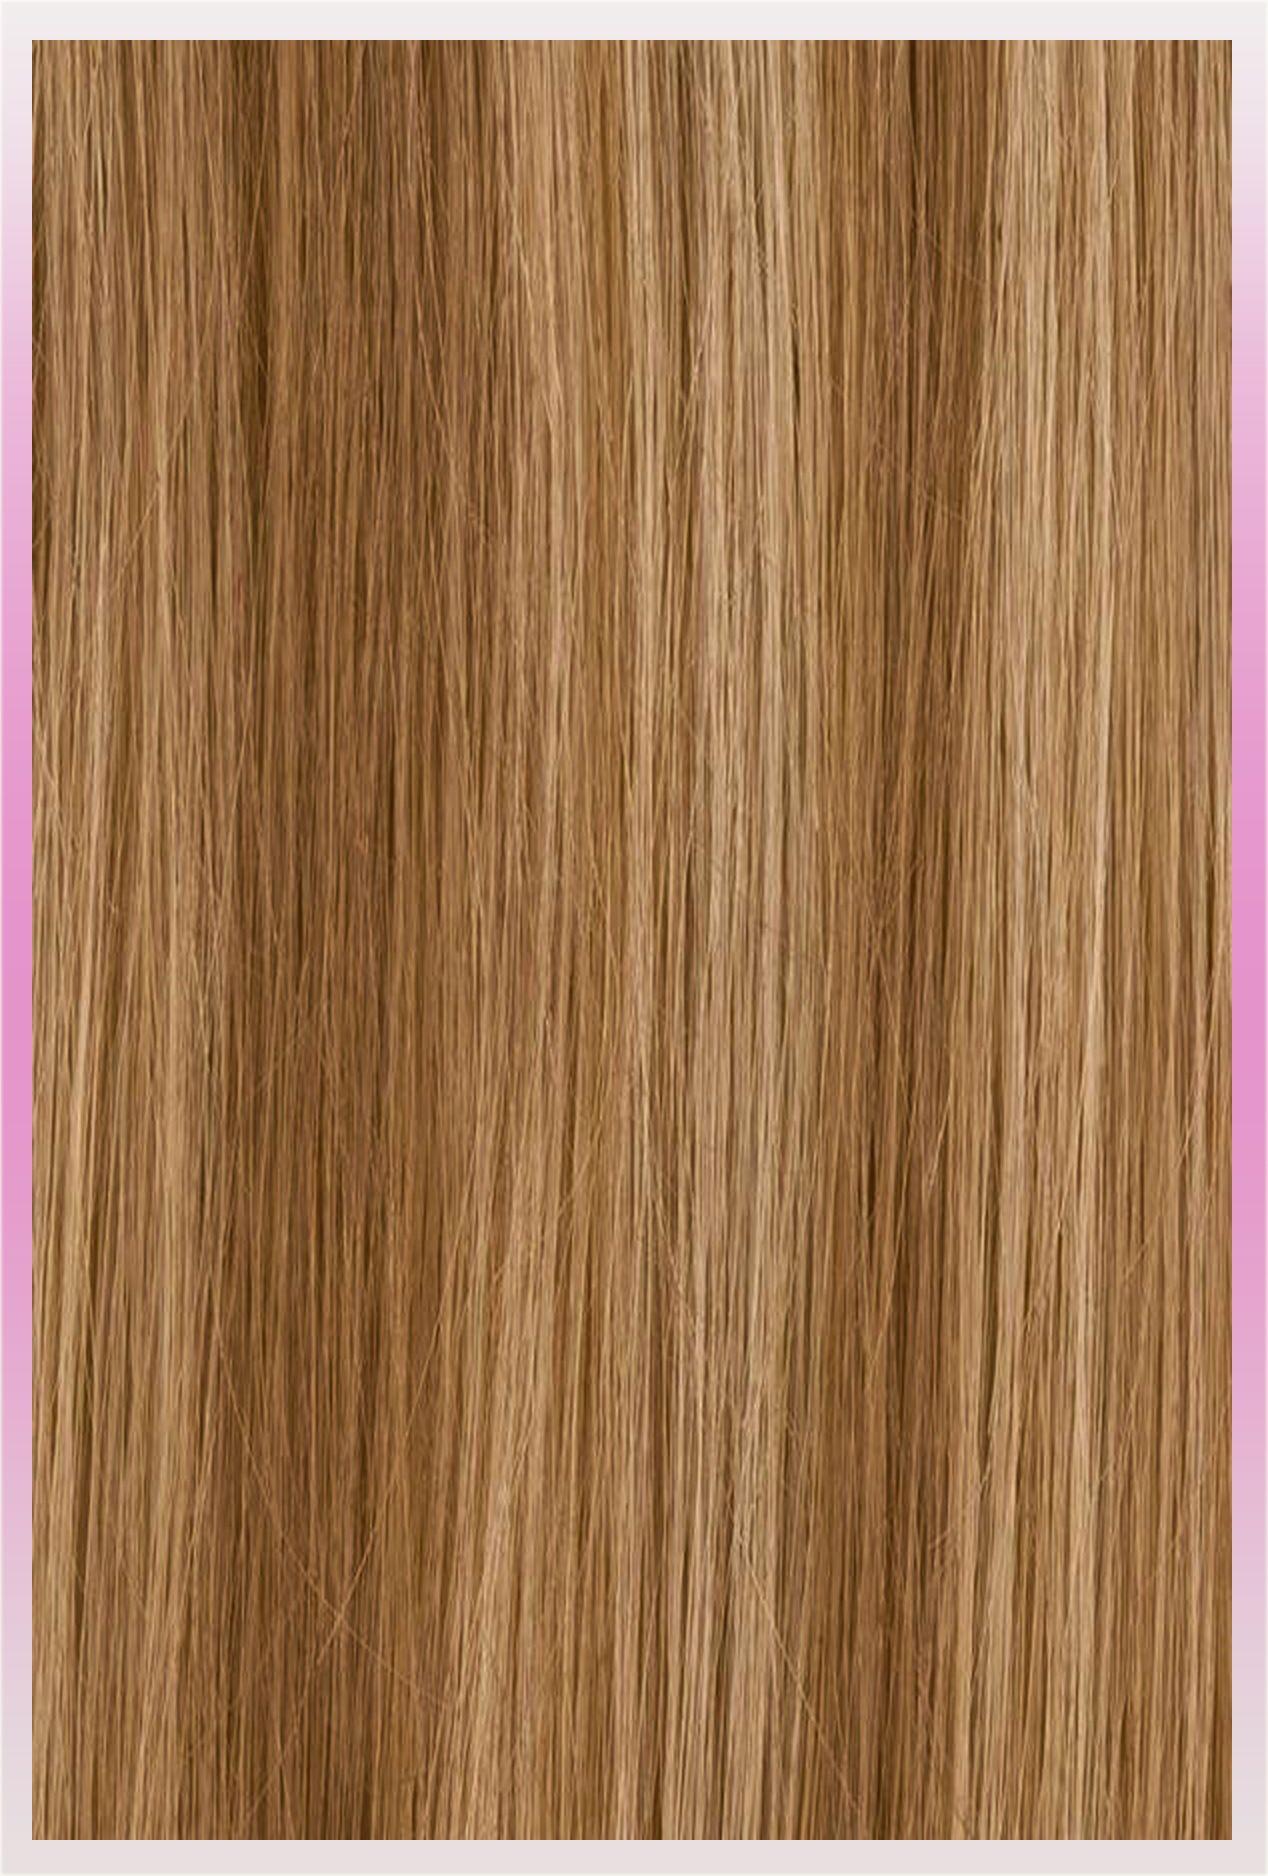 Clip in ponytail human hair extensions i ash brown or dark hair clip in ponytail human hair extensions pmusecretfo Choice Image